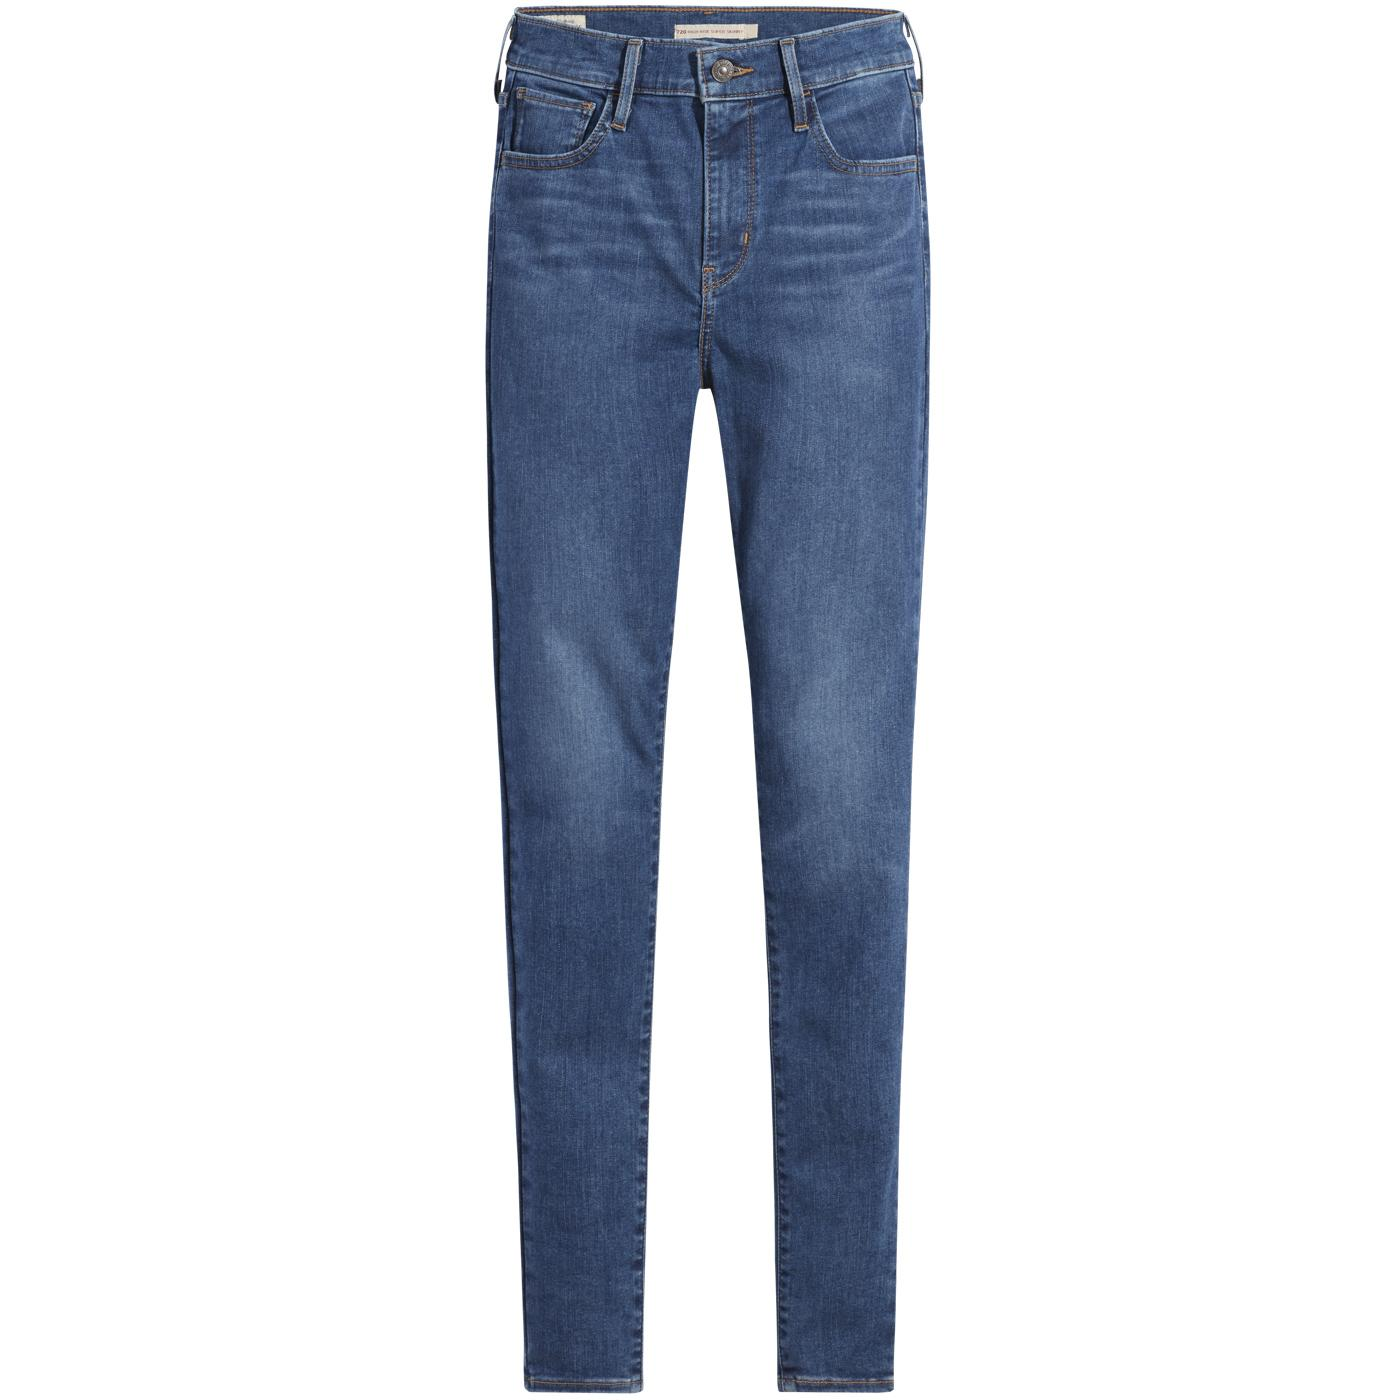 LEVI'S 720 High-Rise Super Skinny Jeans (EC)